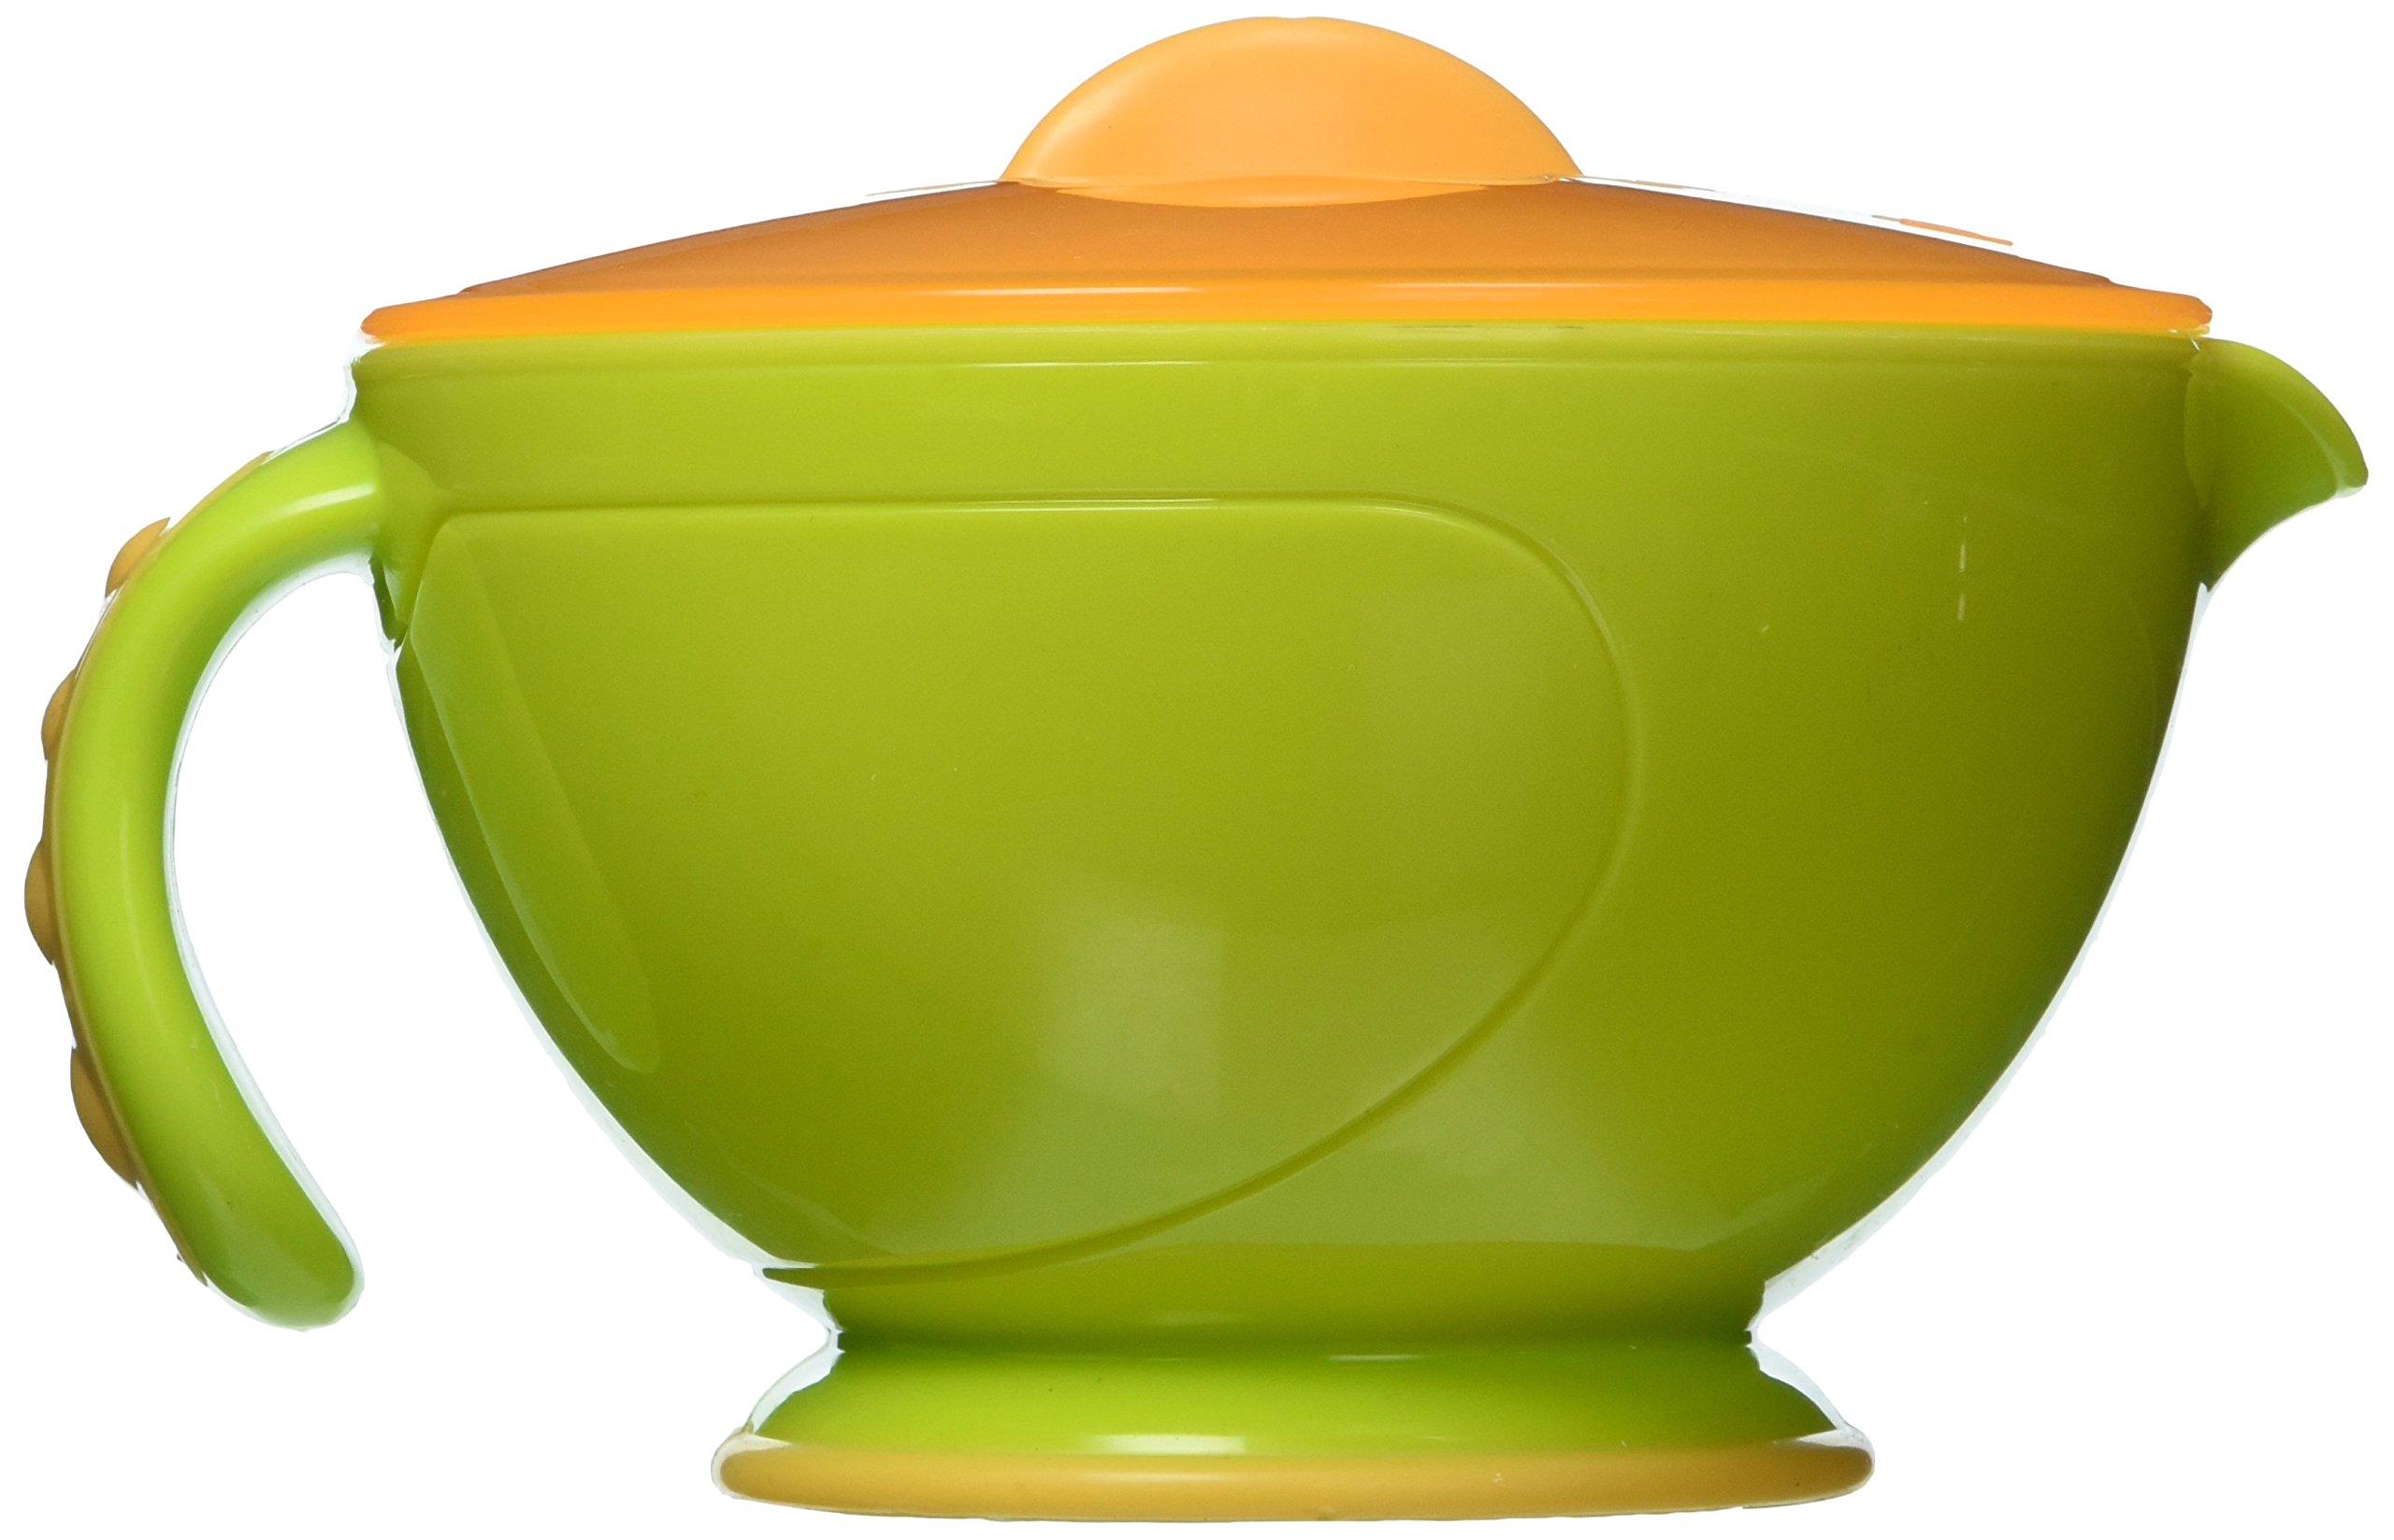 Nuby Garden Fresh Steam 'N' Mash Baby Food Prep Bowl and Food Masher Green/Orange